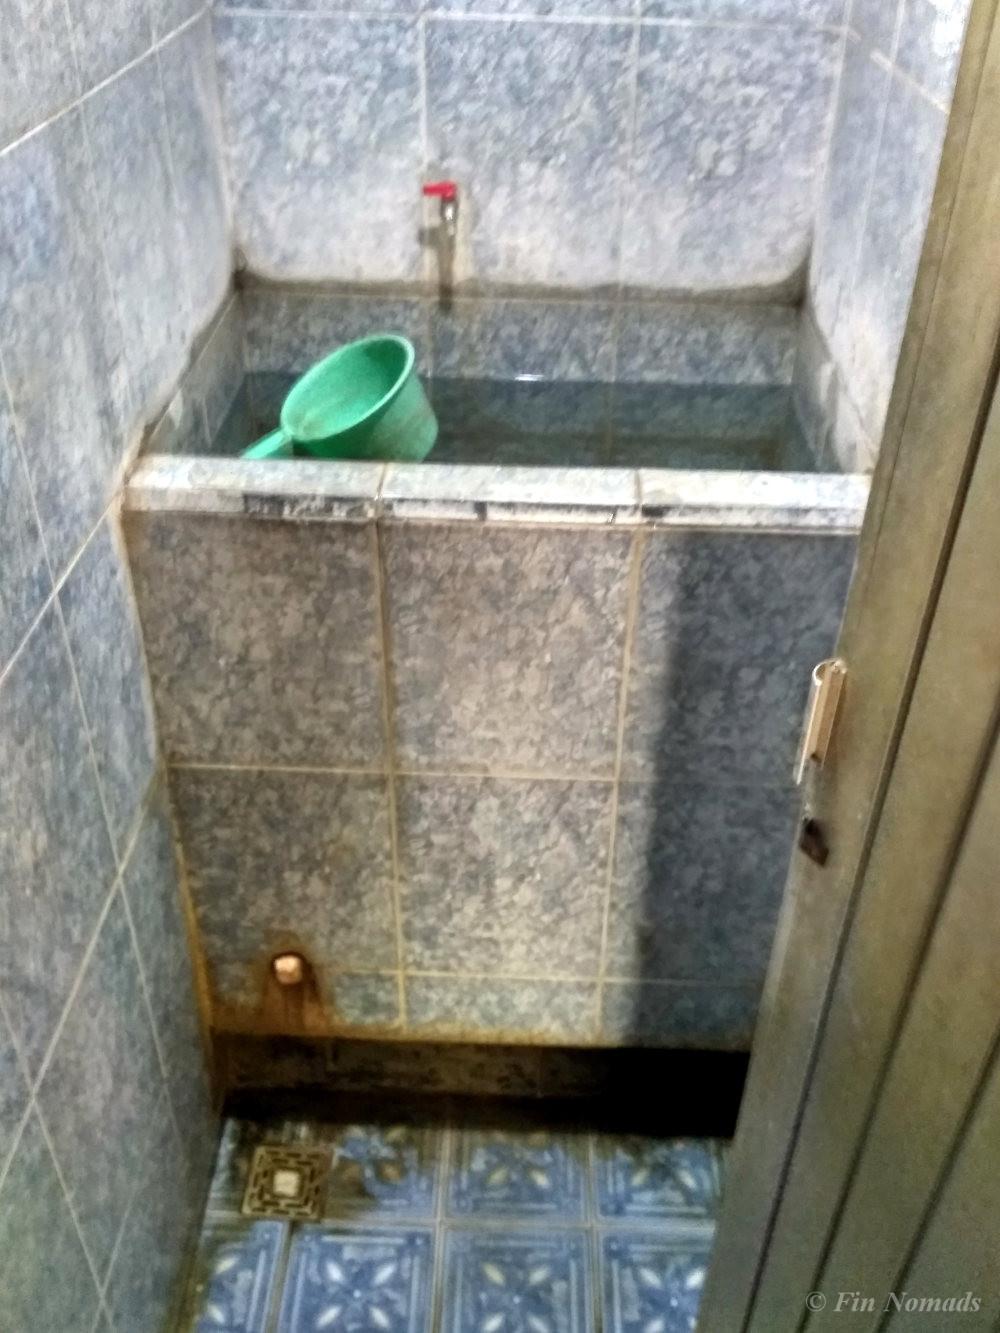 Indonesian toilet